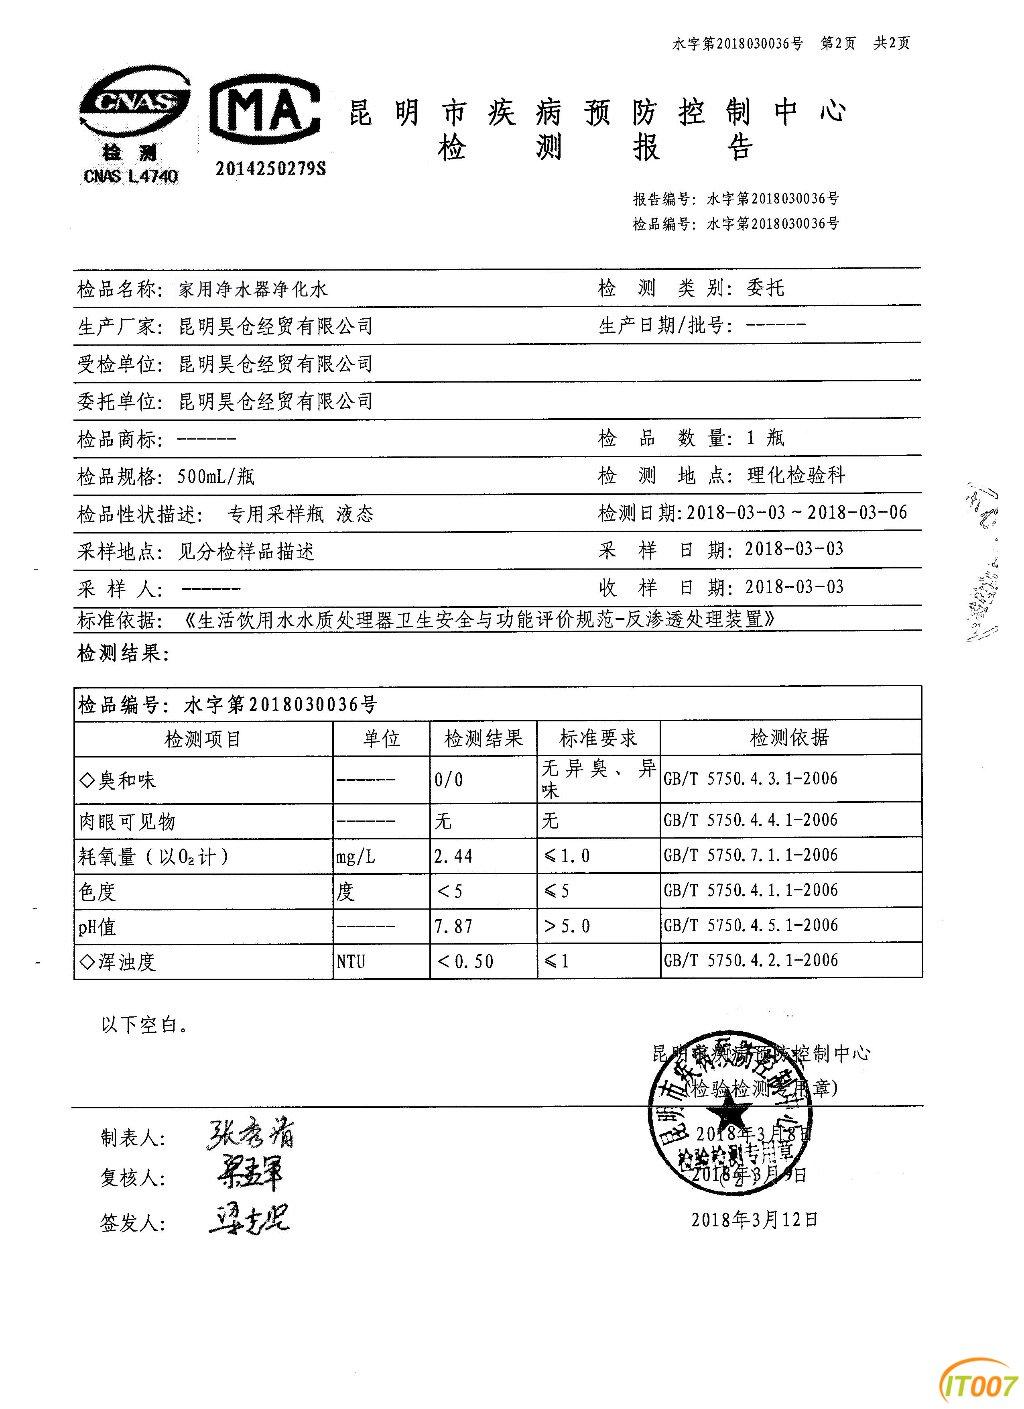 745D6B8B-2C62-4104-9E64-394EC5D09358.jpeg